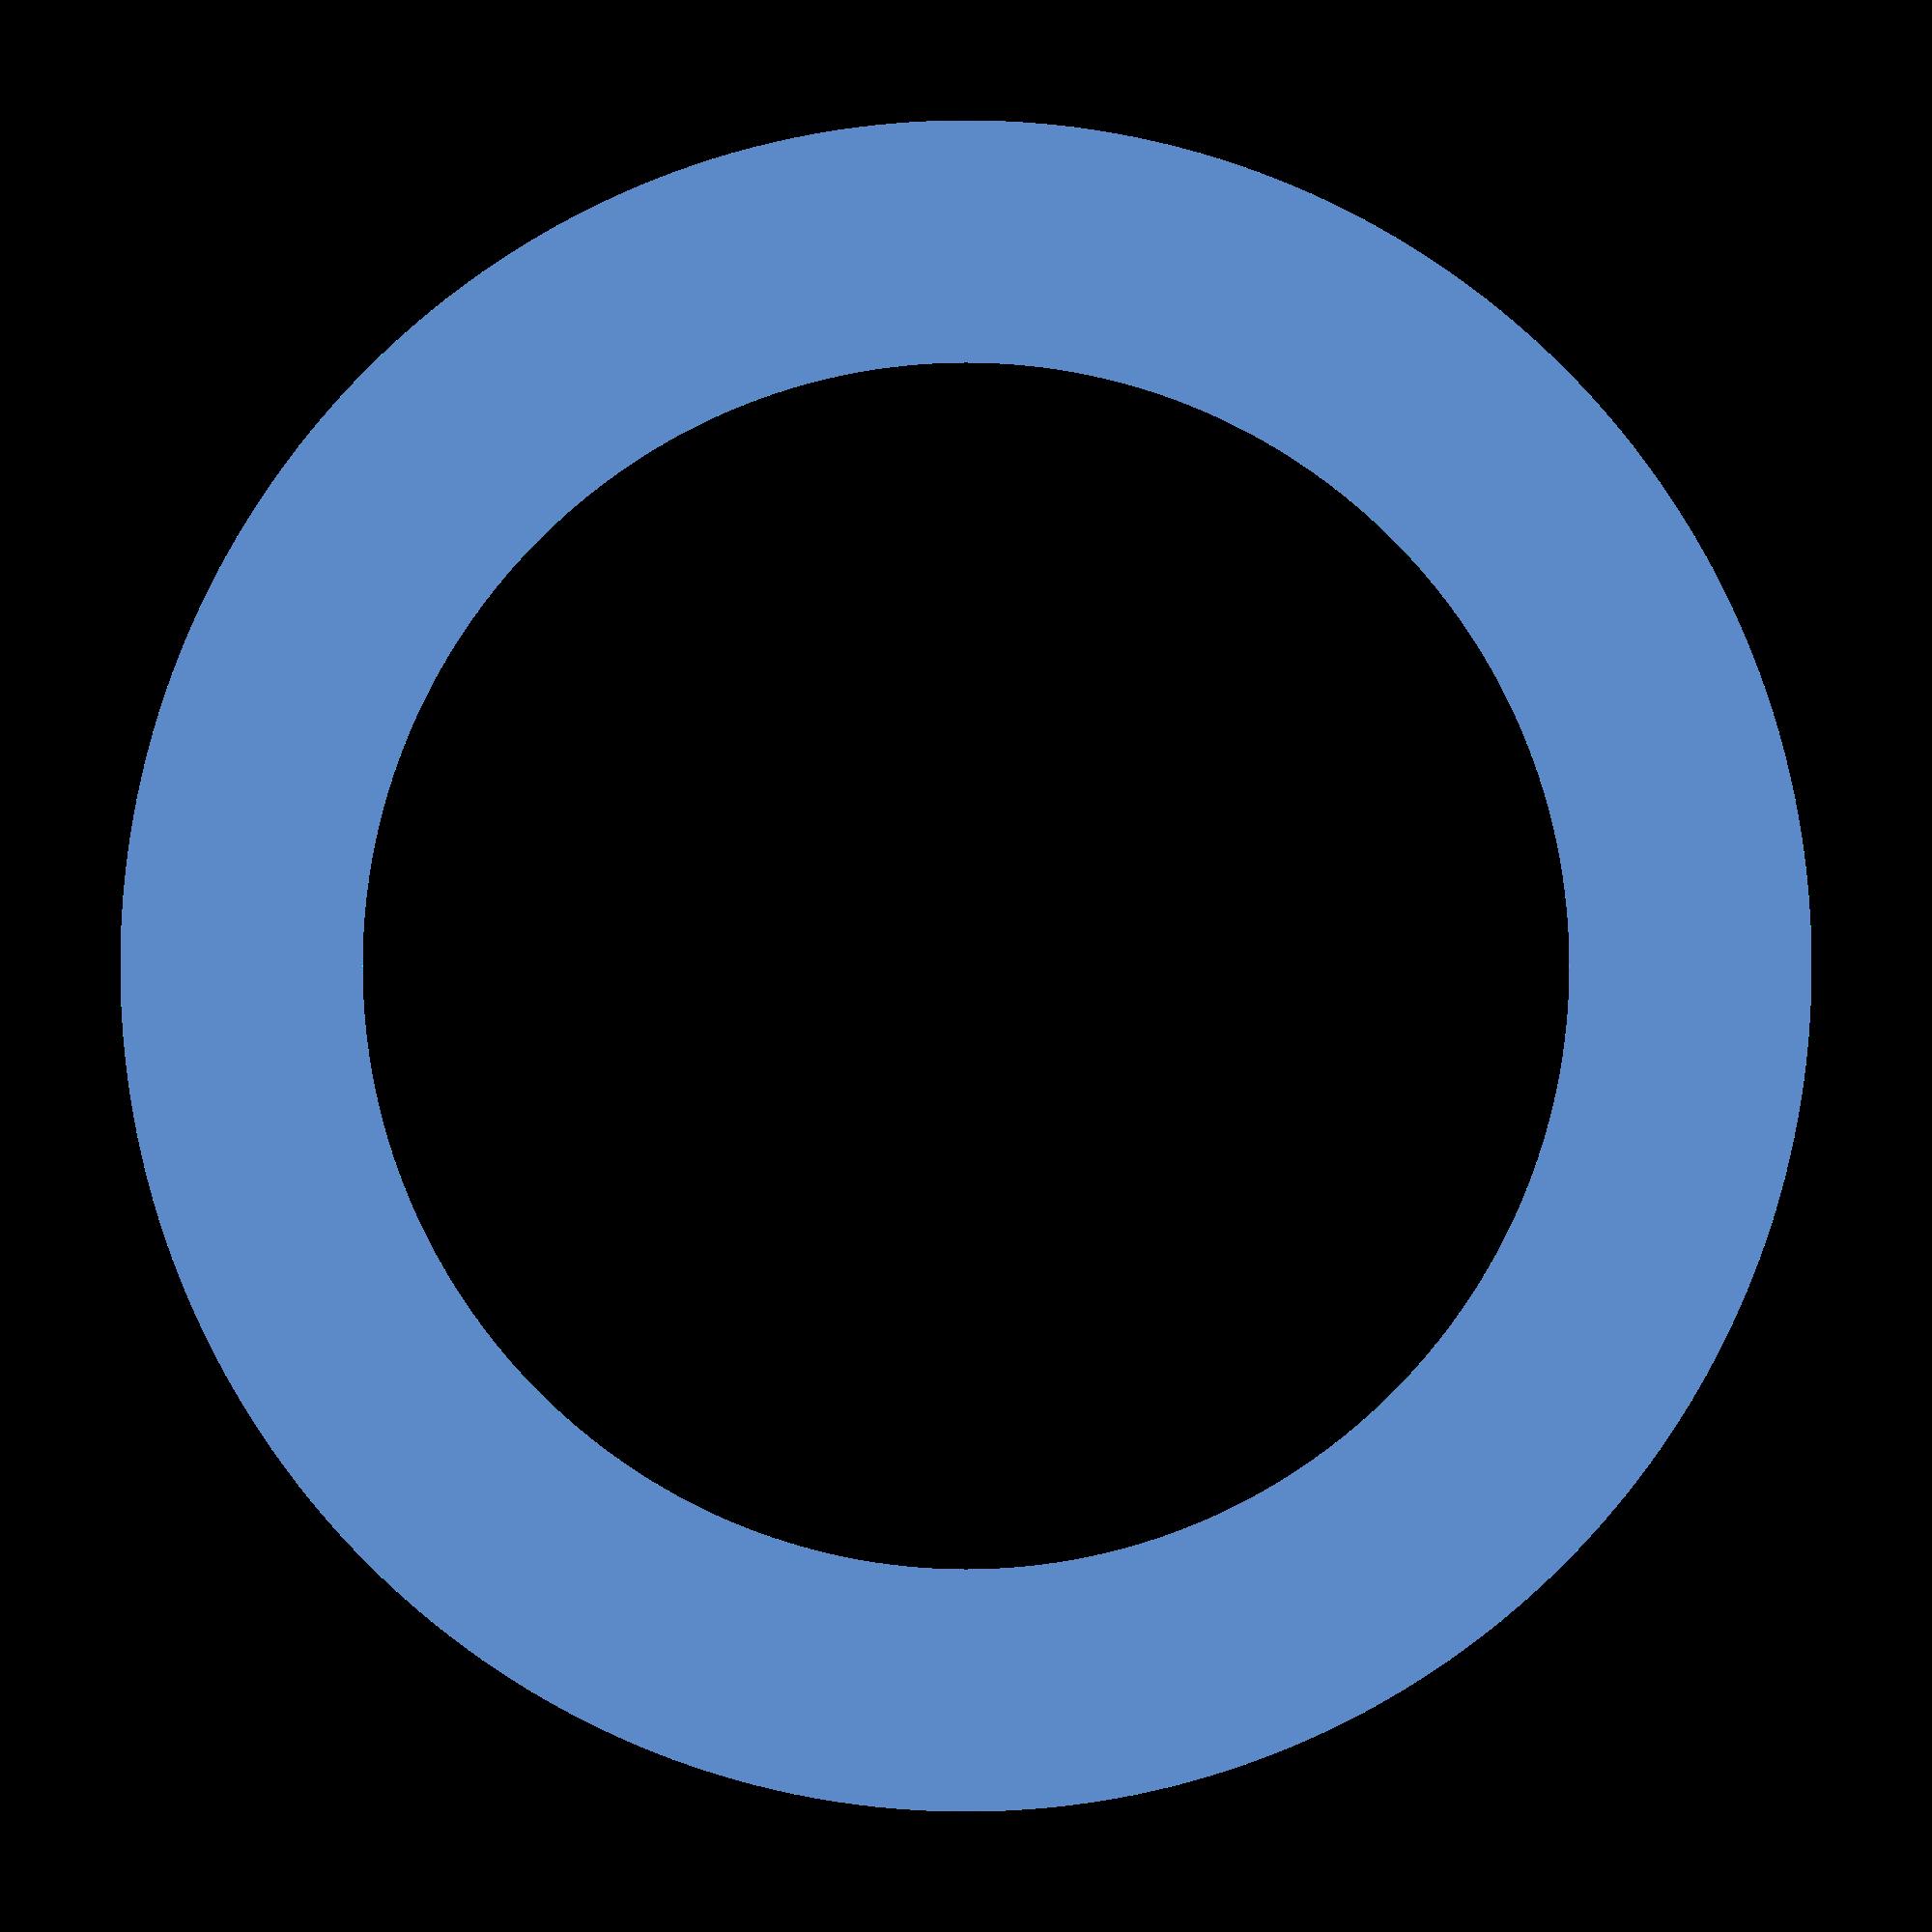 2000x2000 Fileblue Circle For Diabetes.svg